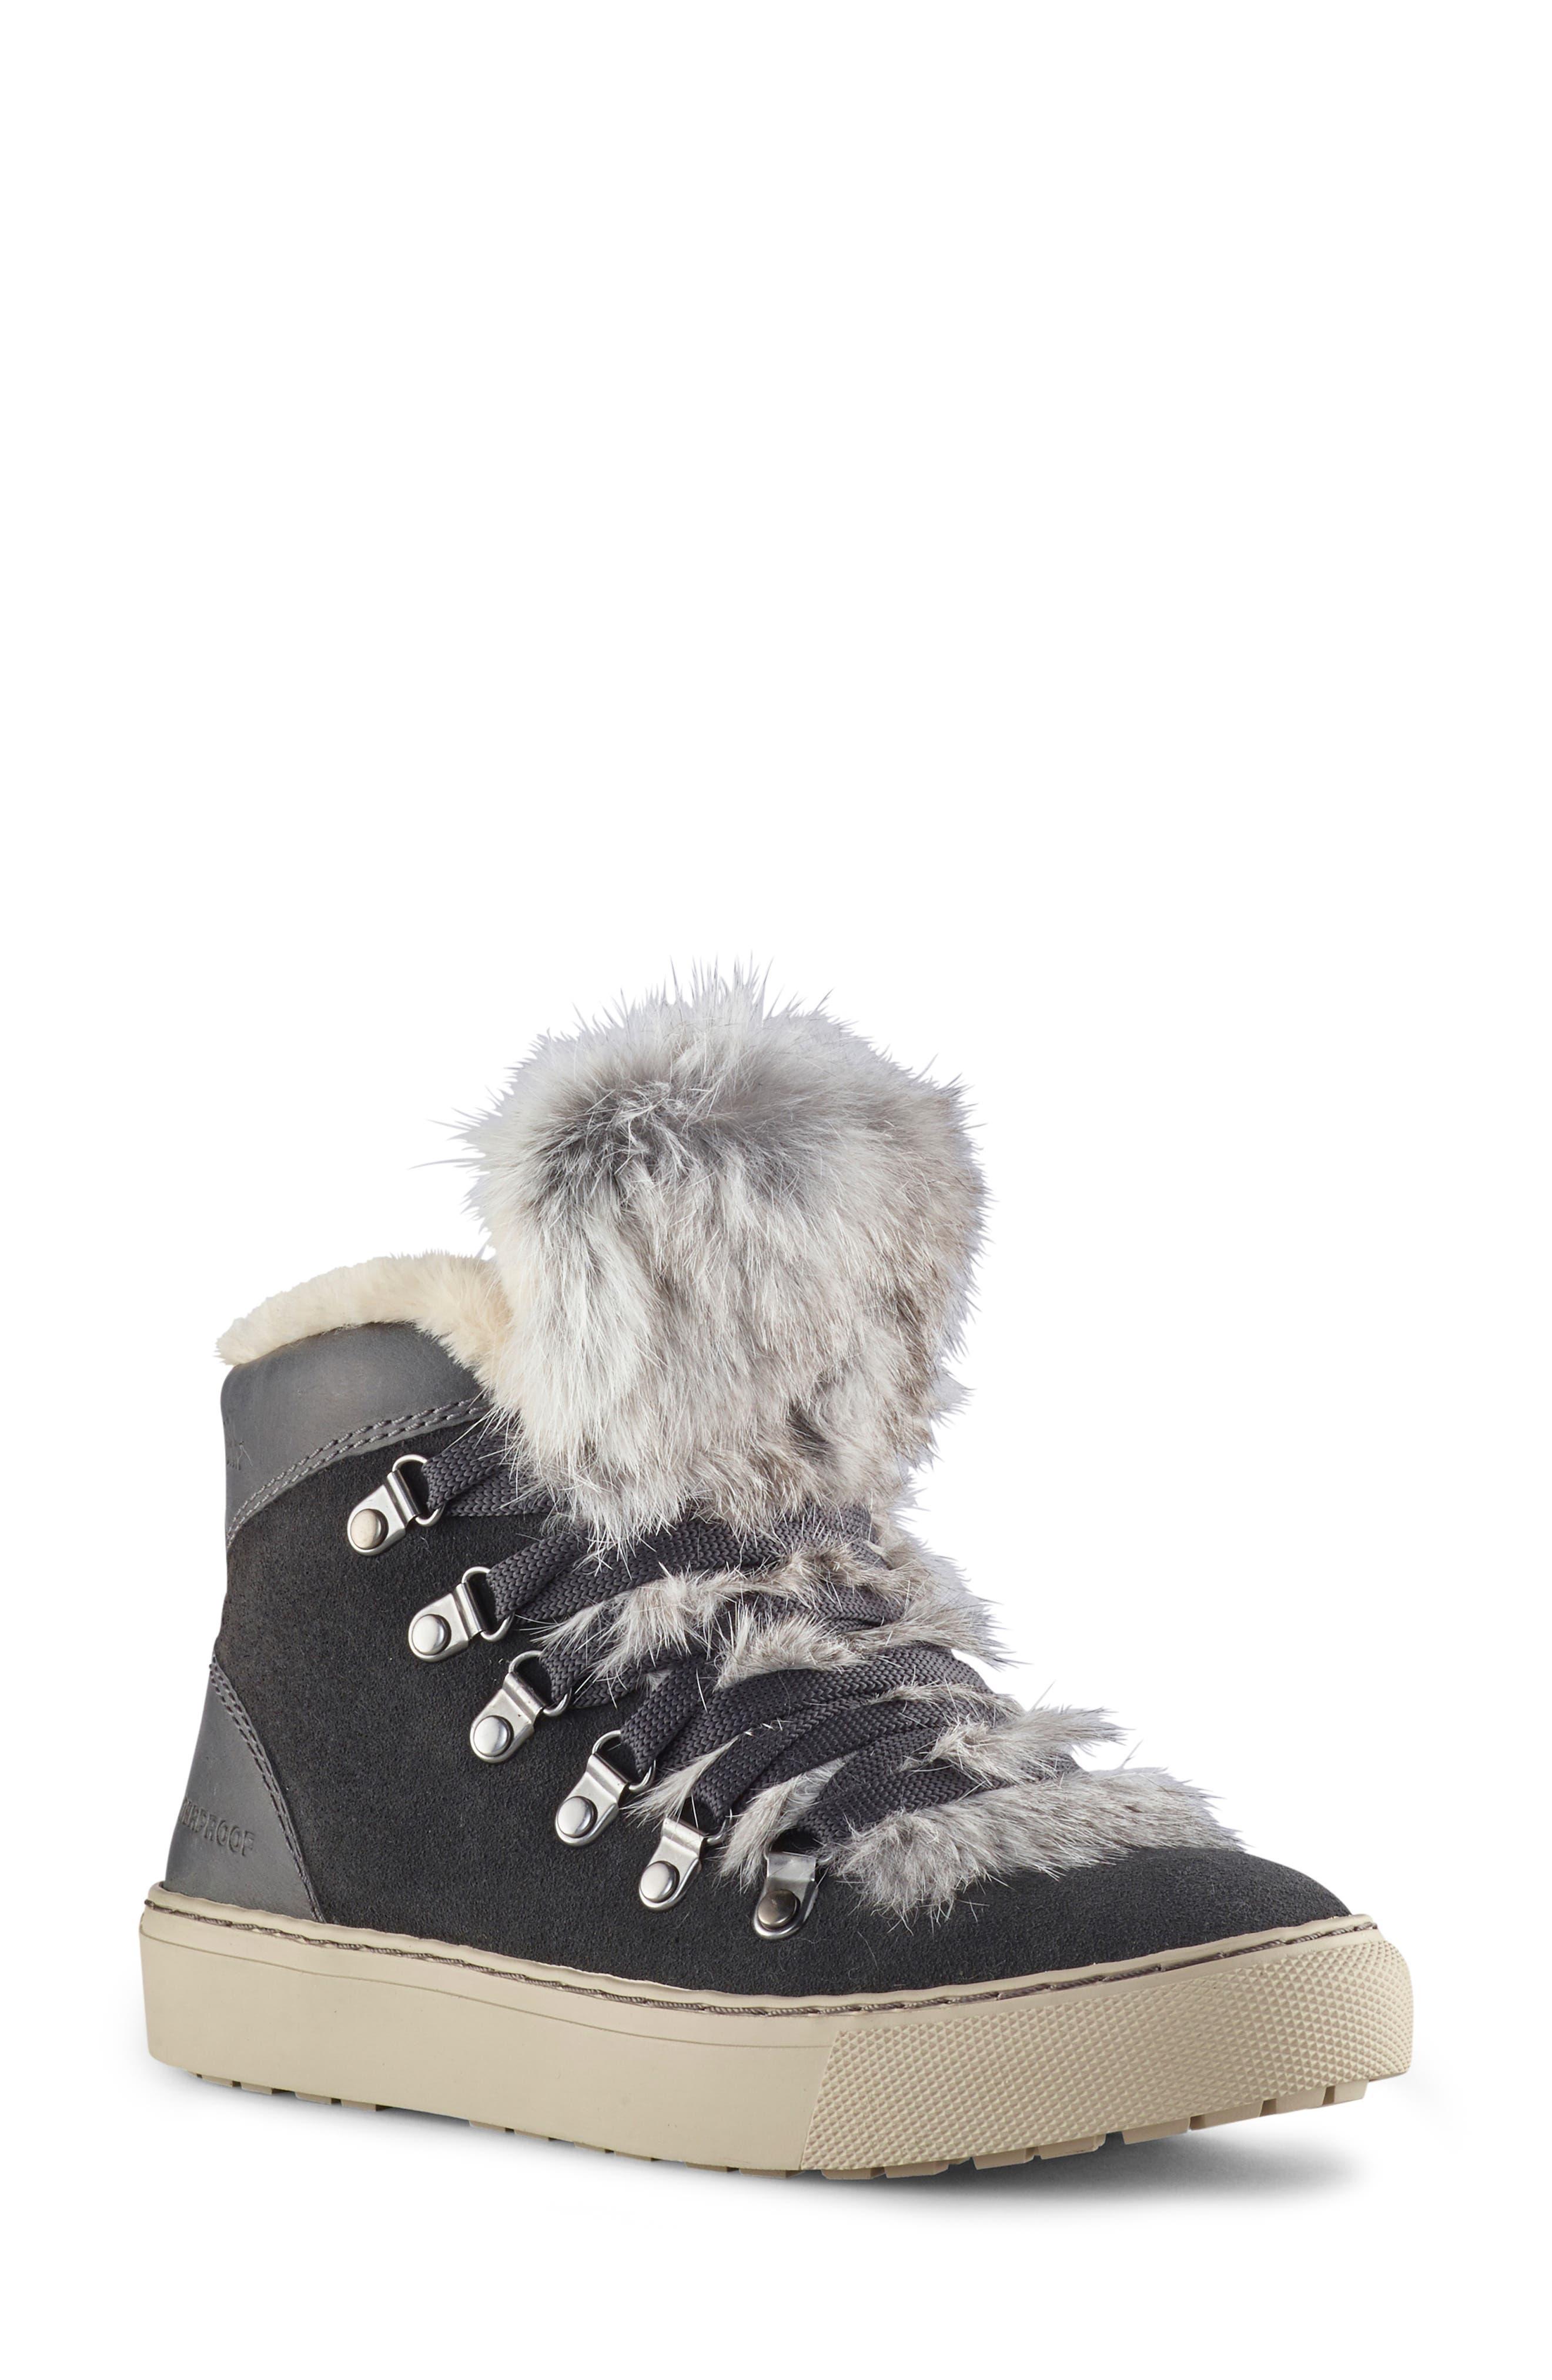 COUGAR,                             Dani High Top Sneaker with Genuine Rabbit Fur Trim,                             Main thumbnail 1, color,                             PEWTER SUEDE